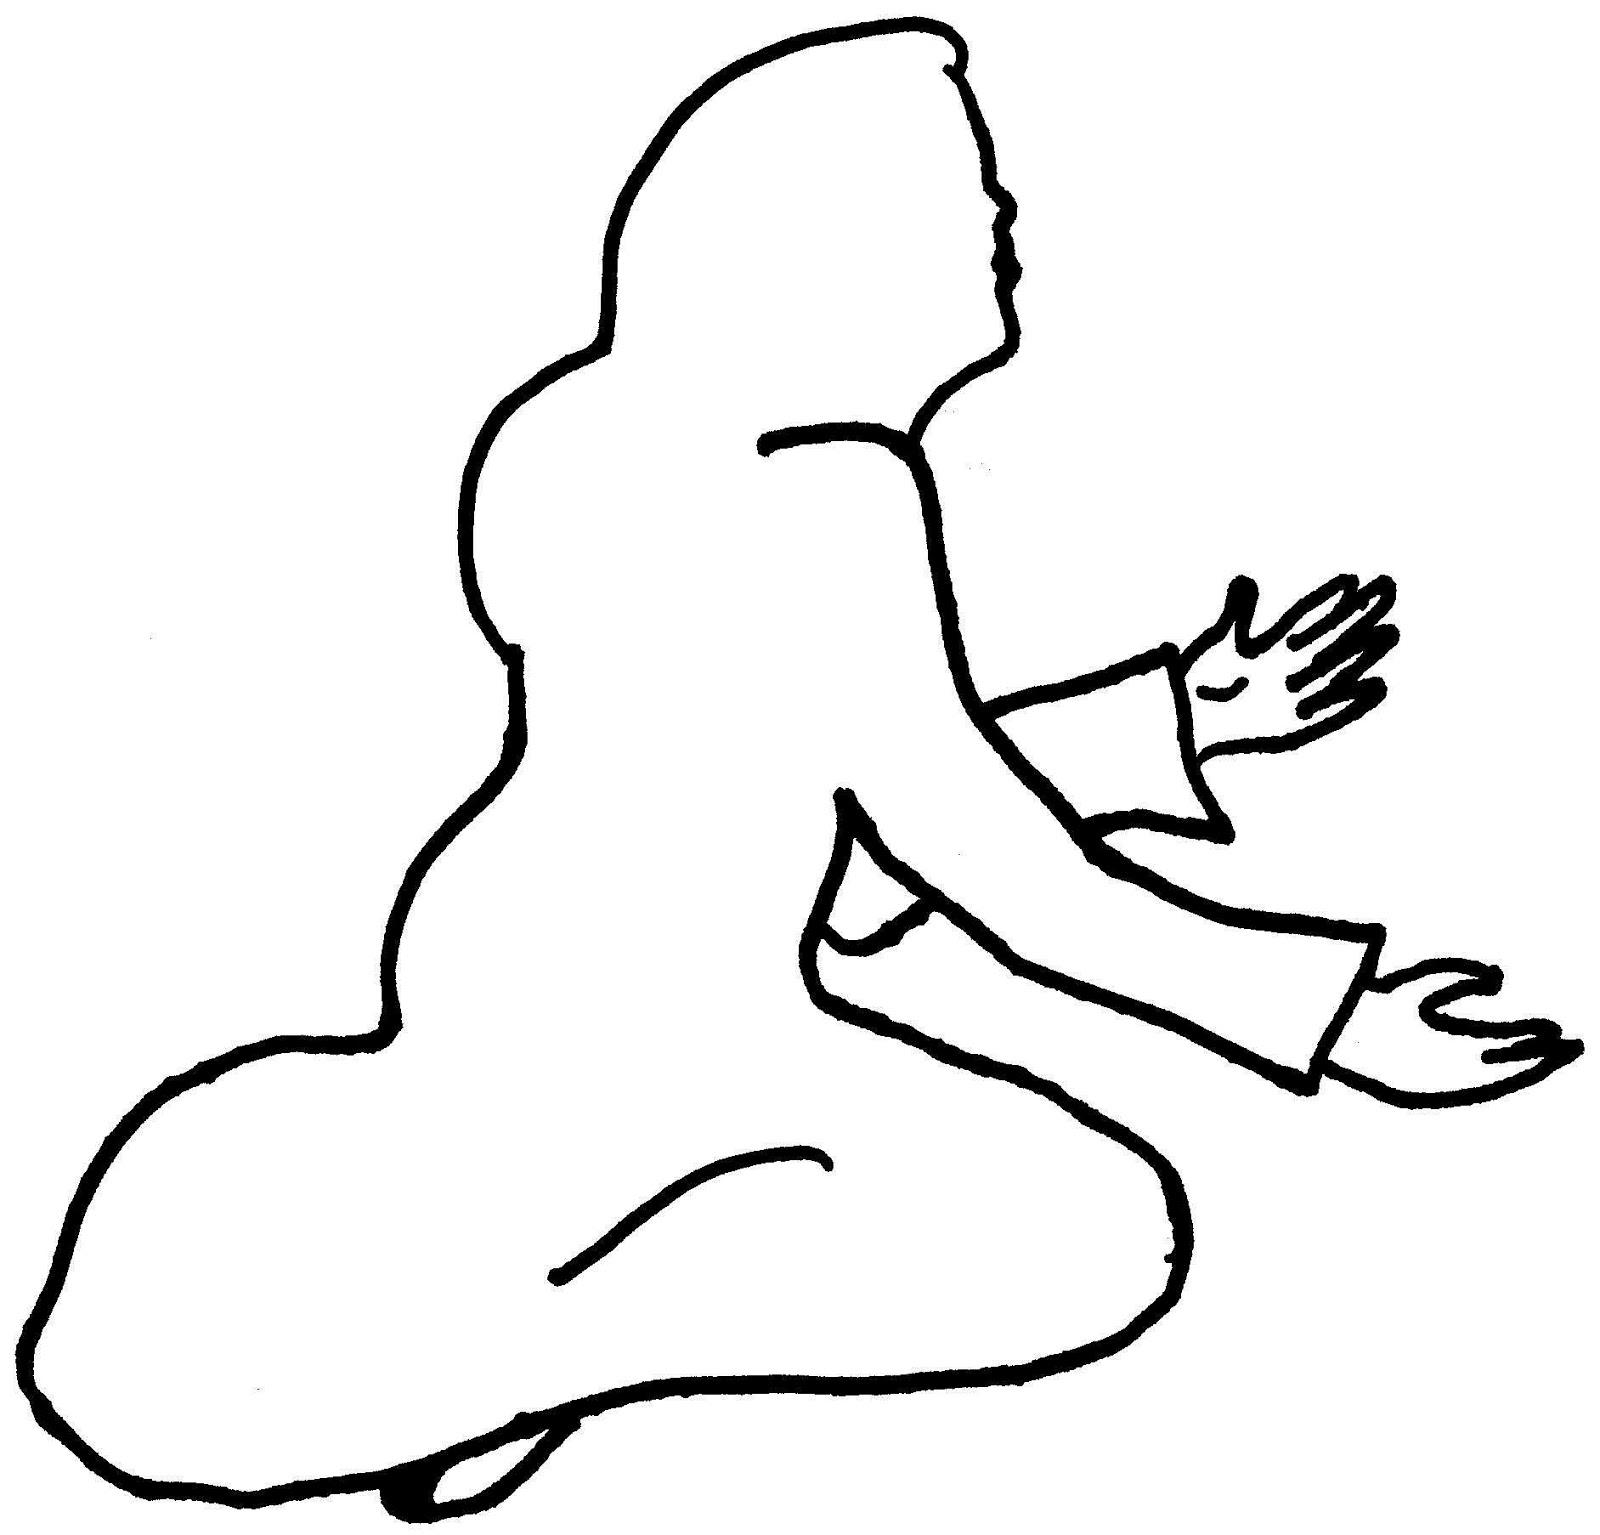 A Blank Body